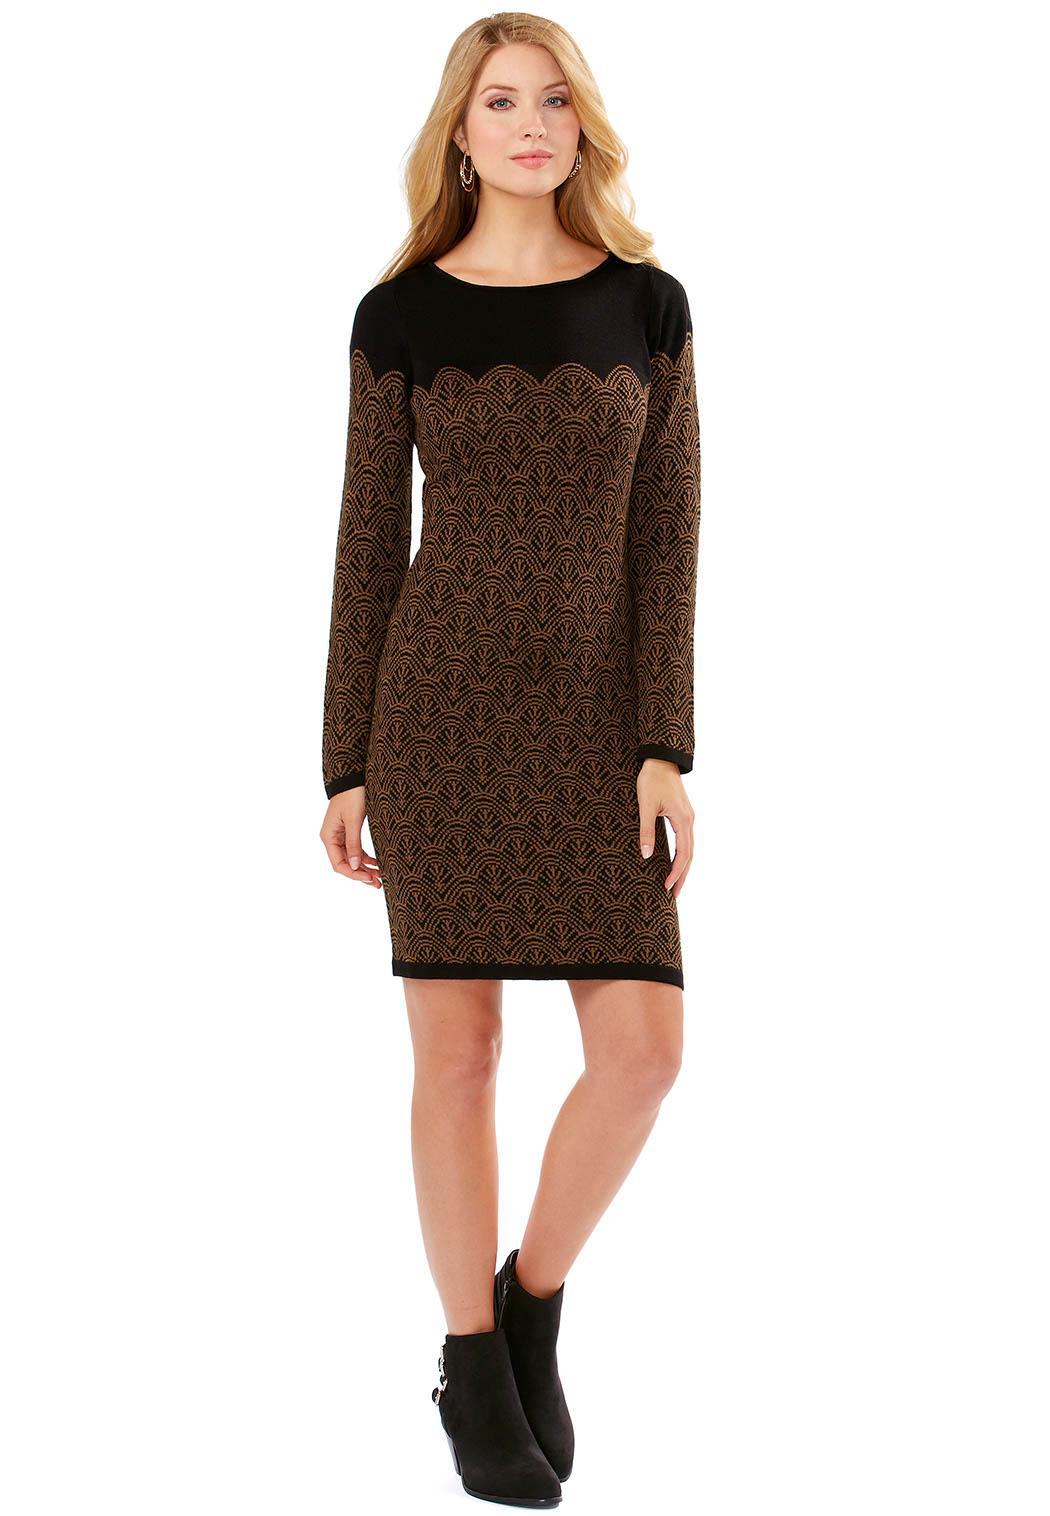 Baggy Turtleneck Sweater